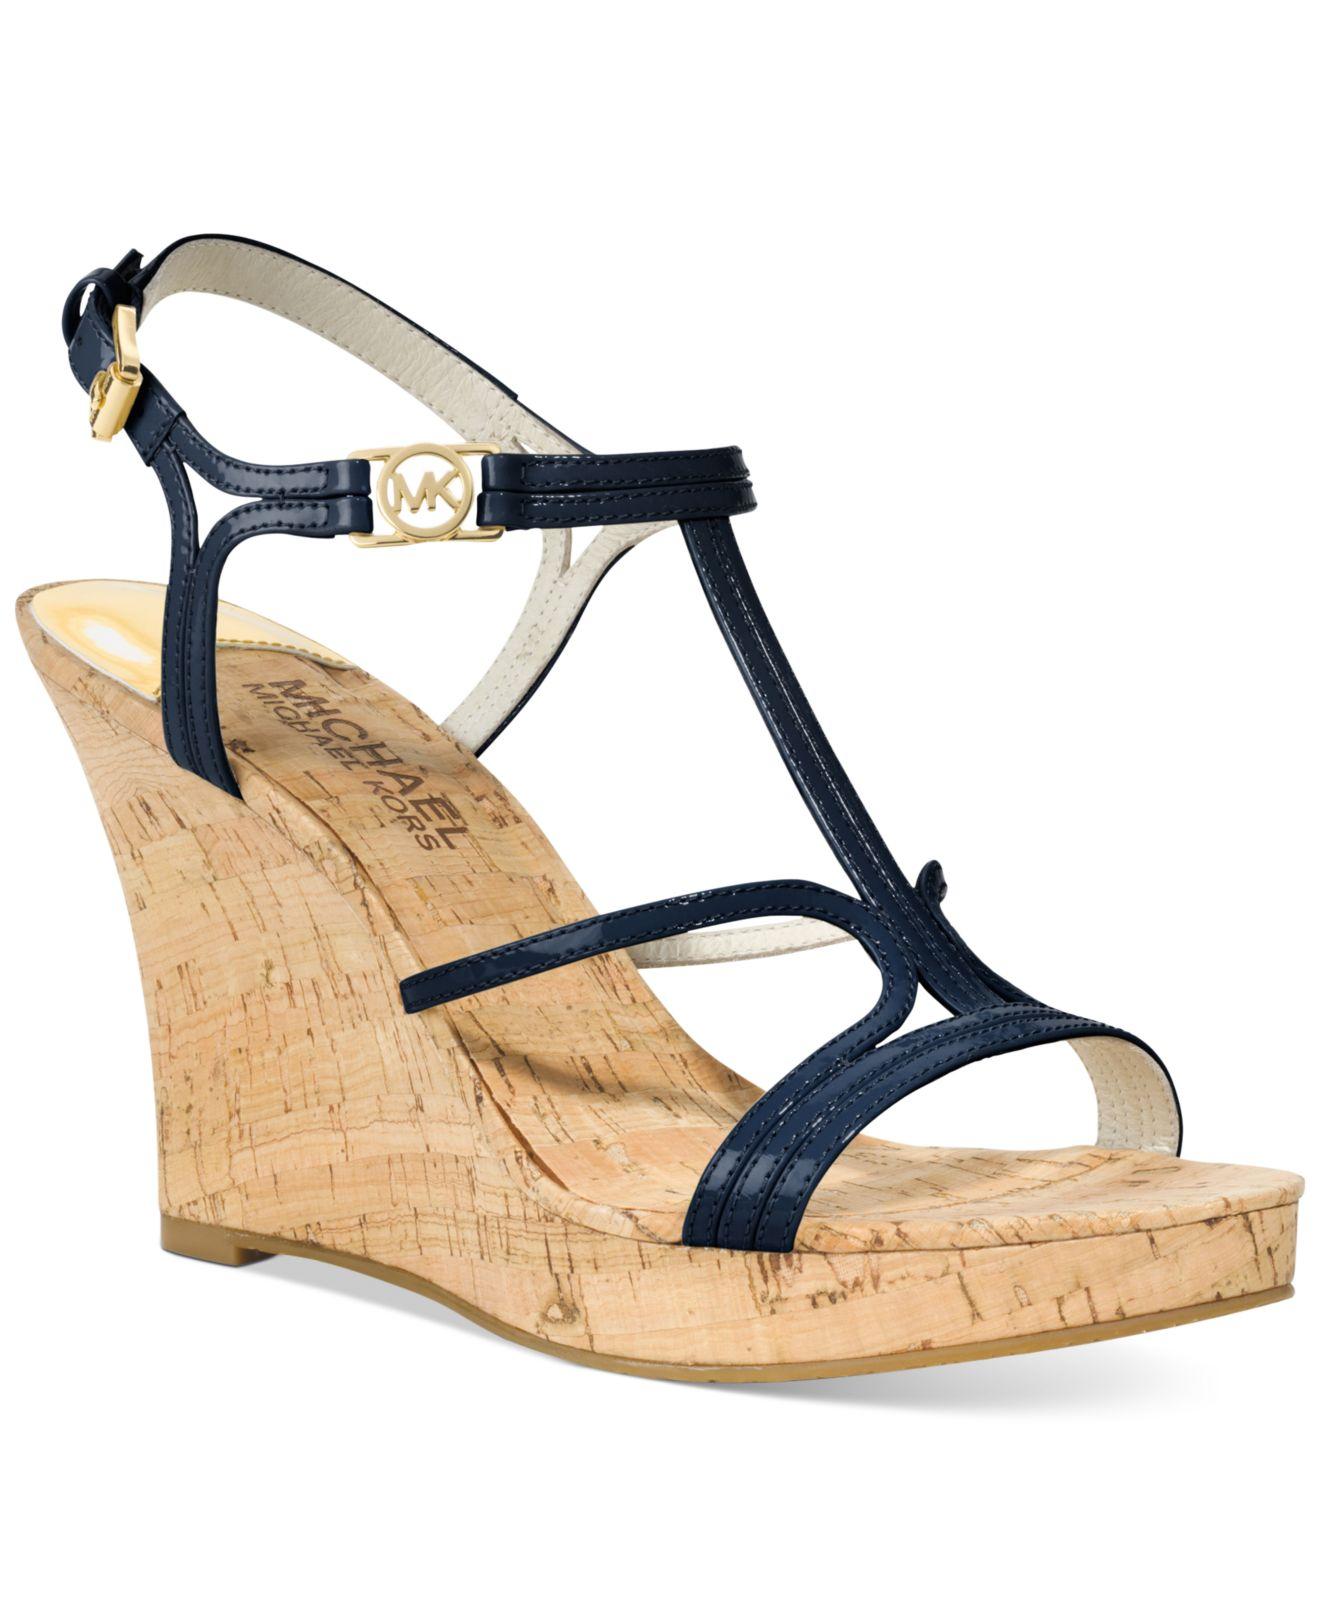 Michael Cicely Platform Wedge Sandals